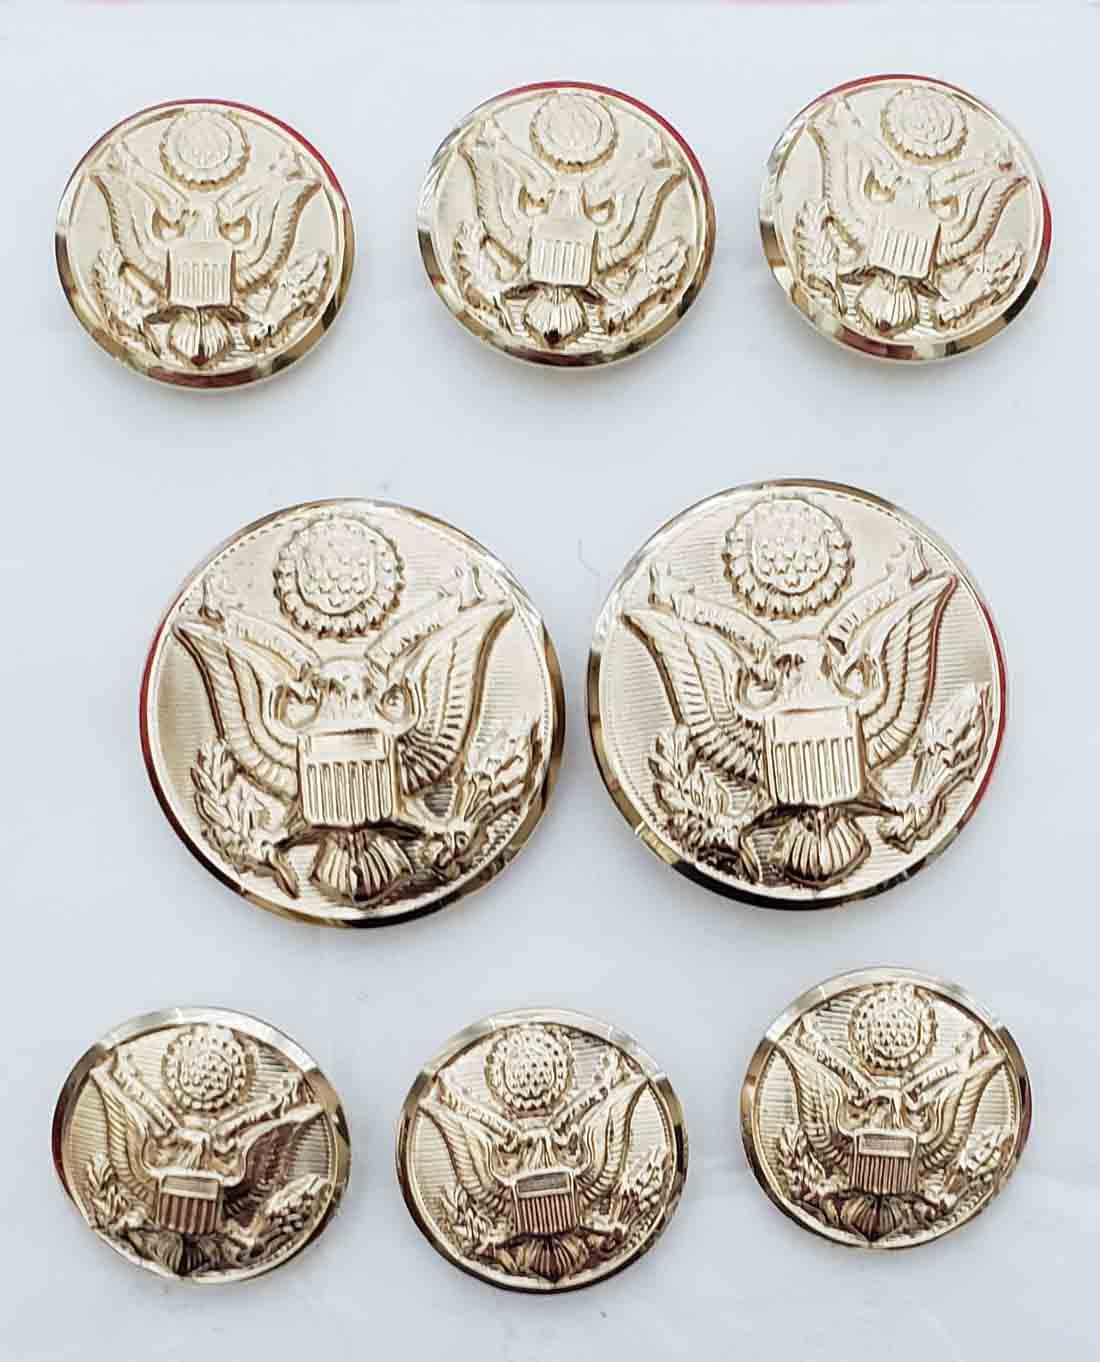 Waterbury Military Style Eagle Emblem Gold Brass Blazer Buttons Set Shank Men's